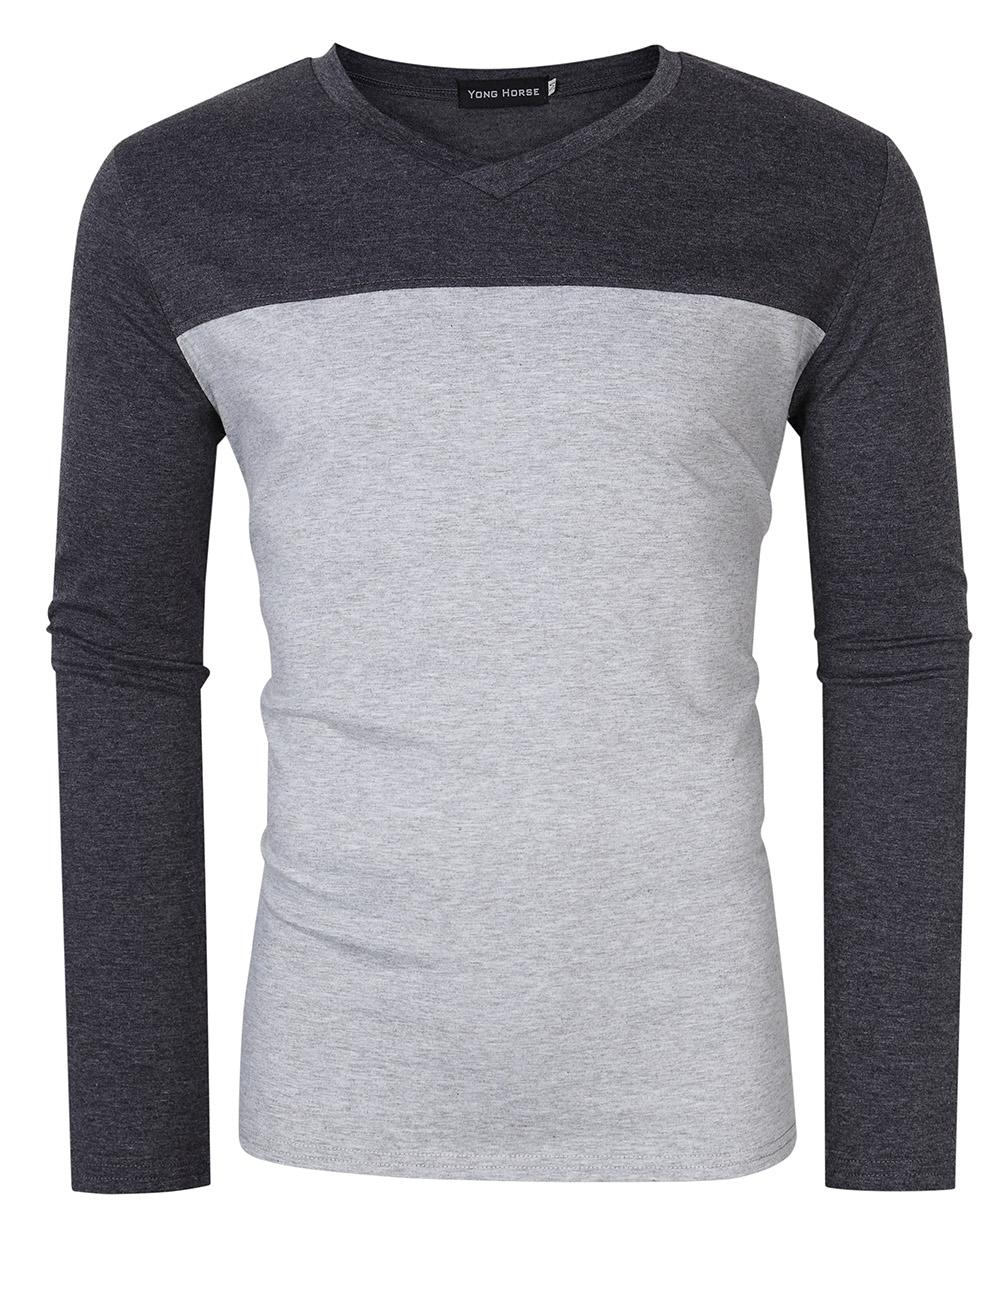 [US Direct] Yong Horse Men's Two Tone Slim Fit Long Sleeve Shirts V-Neck Basic Tee T-Shirt Top flecking gray_XXL